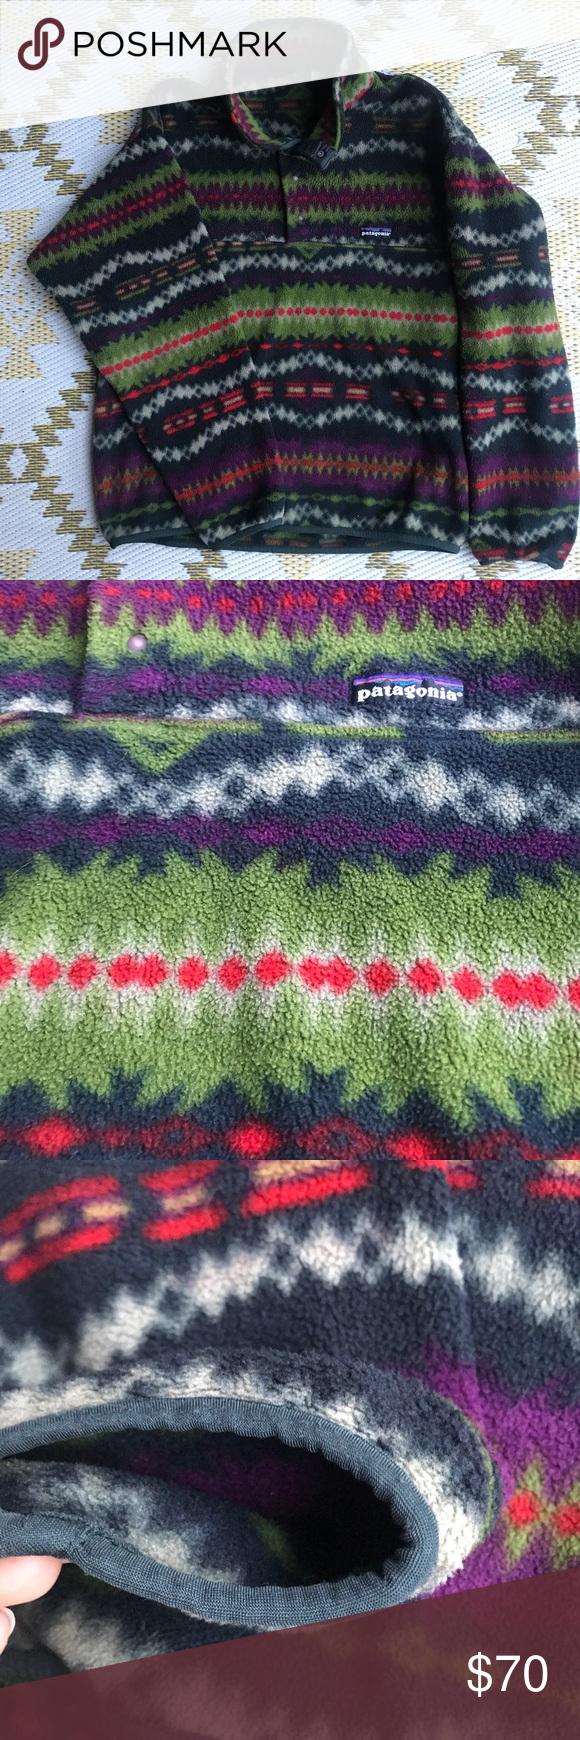 Patagonia synchilla snapt pullover fleece jacket patagonia